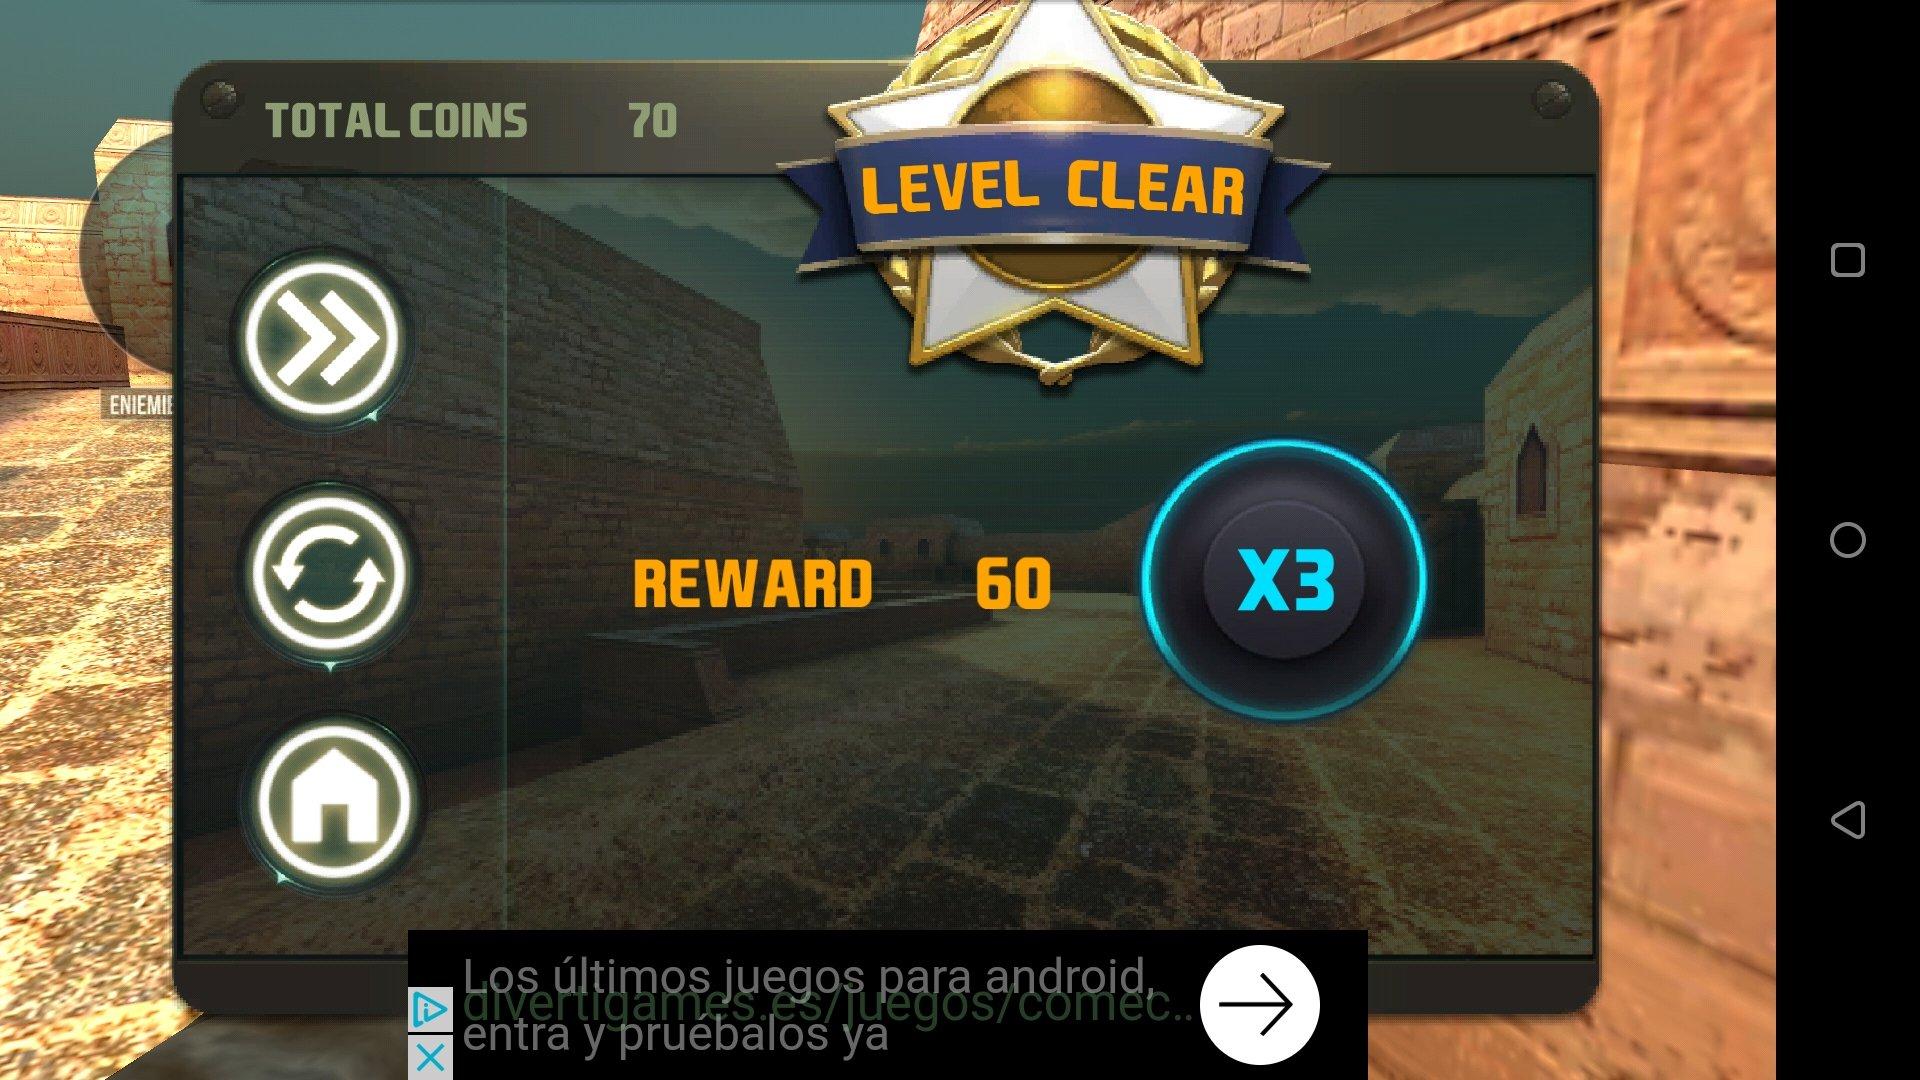 Download gta sa 1 05 apk only | GTA San Andreas APK Download